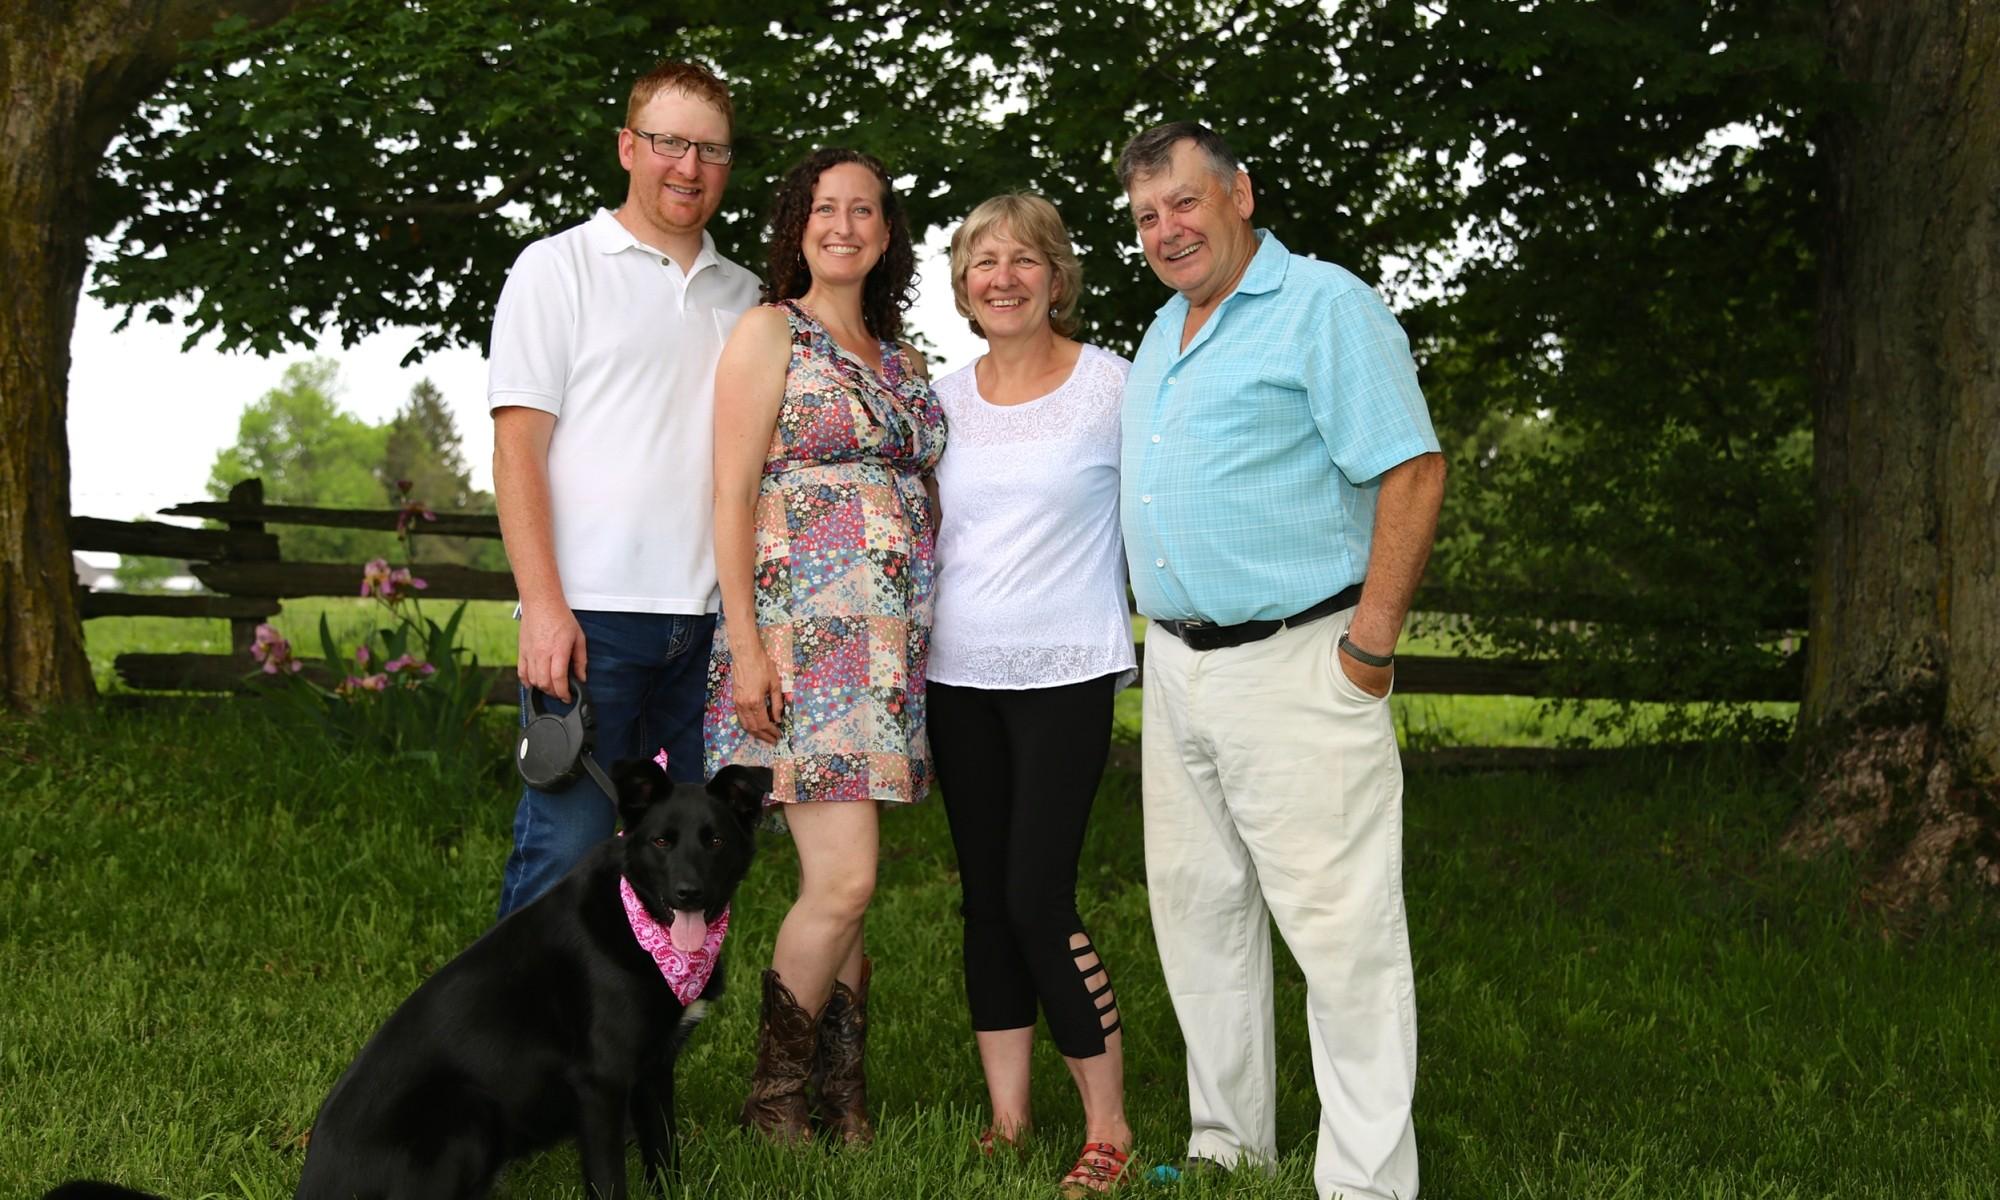 Team at Valleykirk Farms